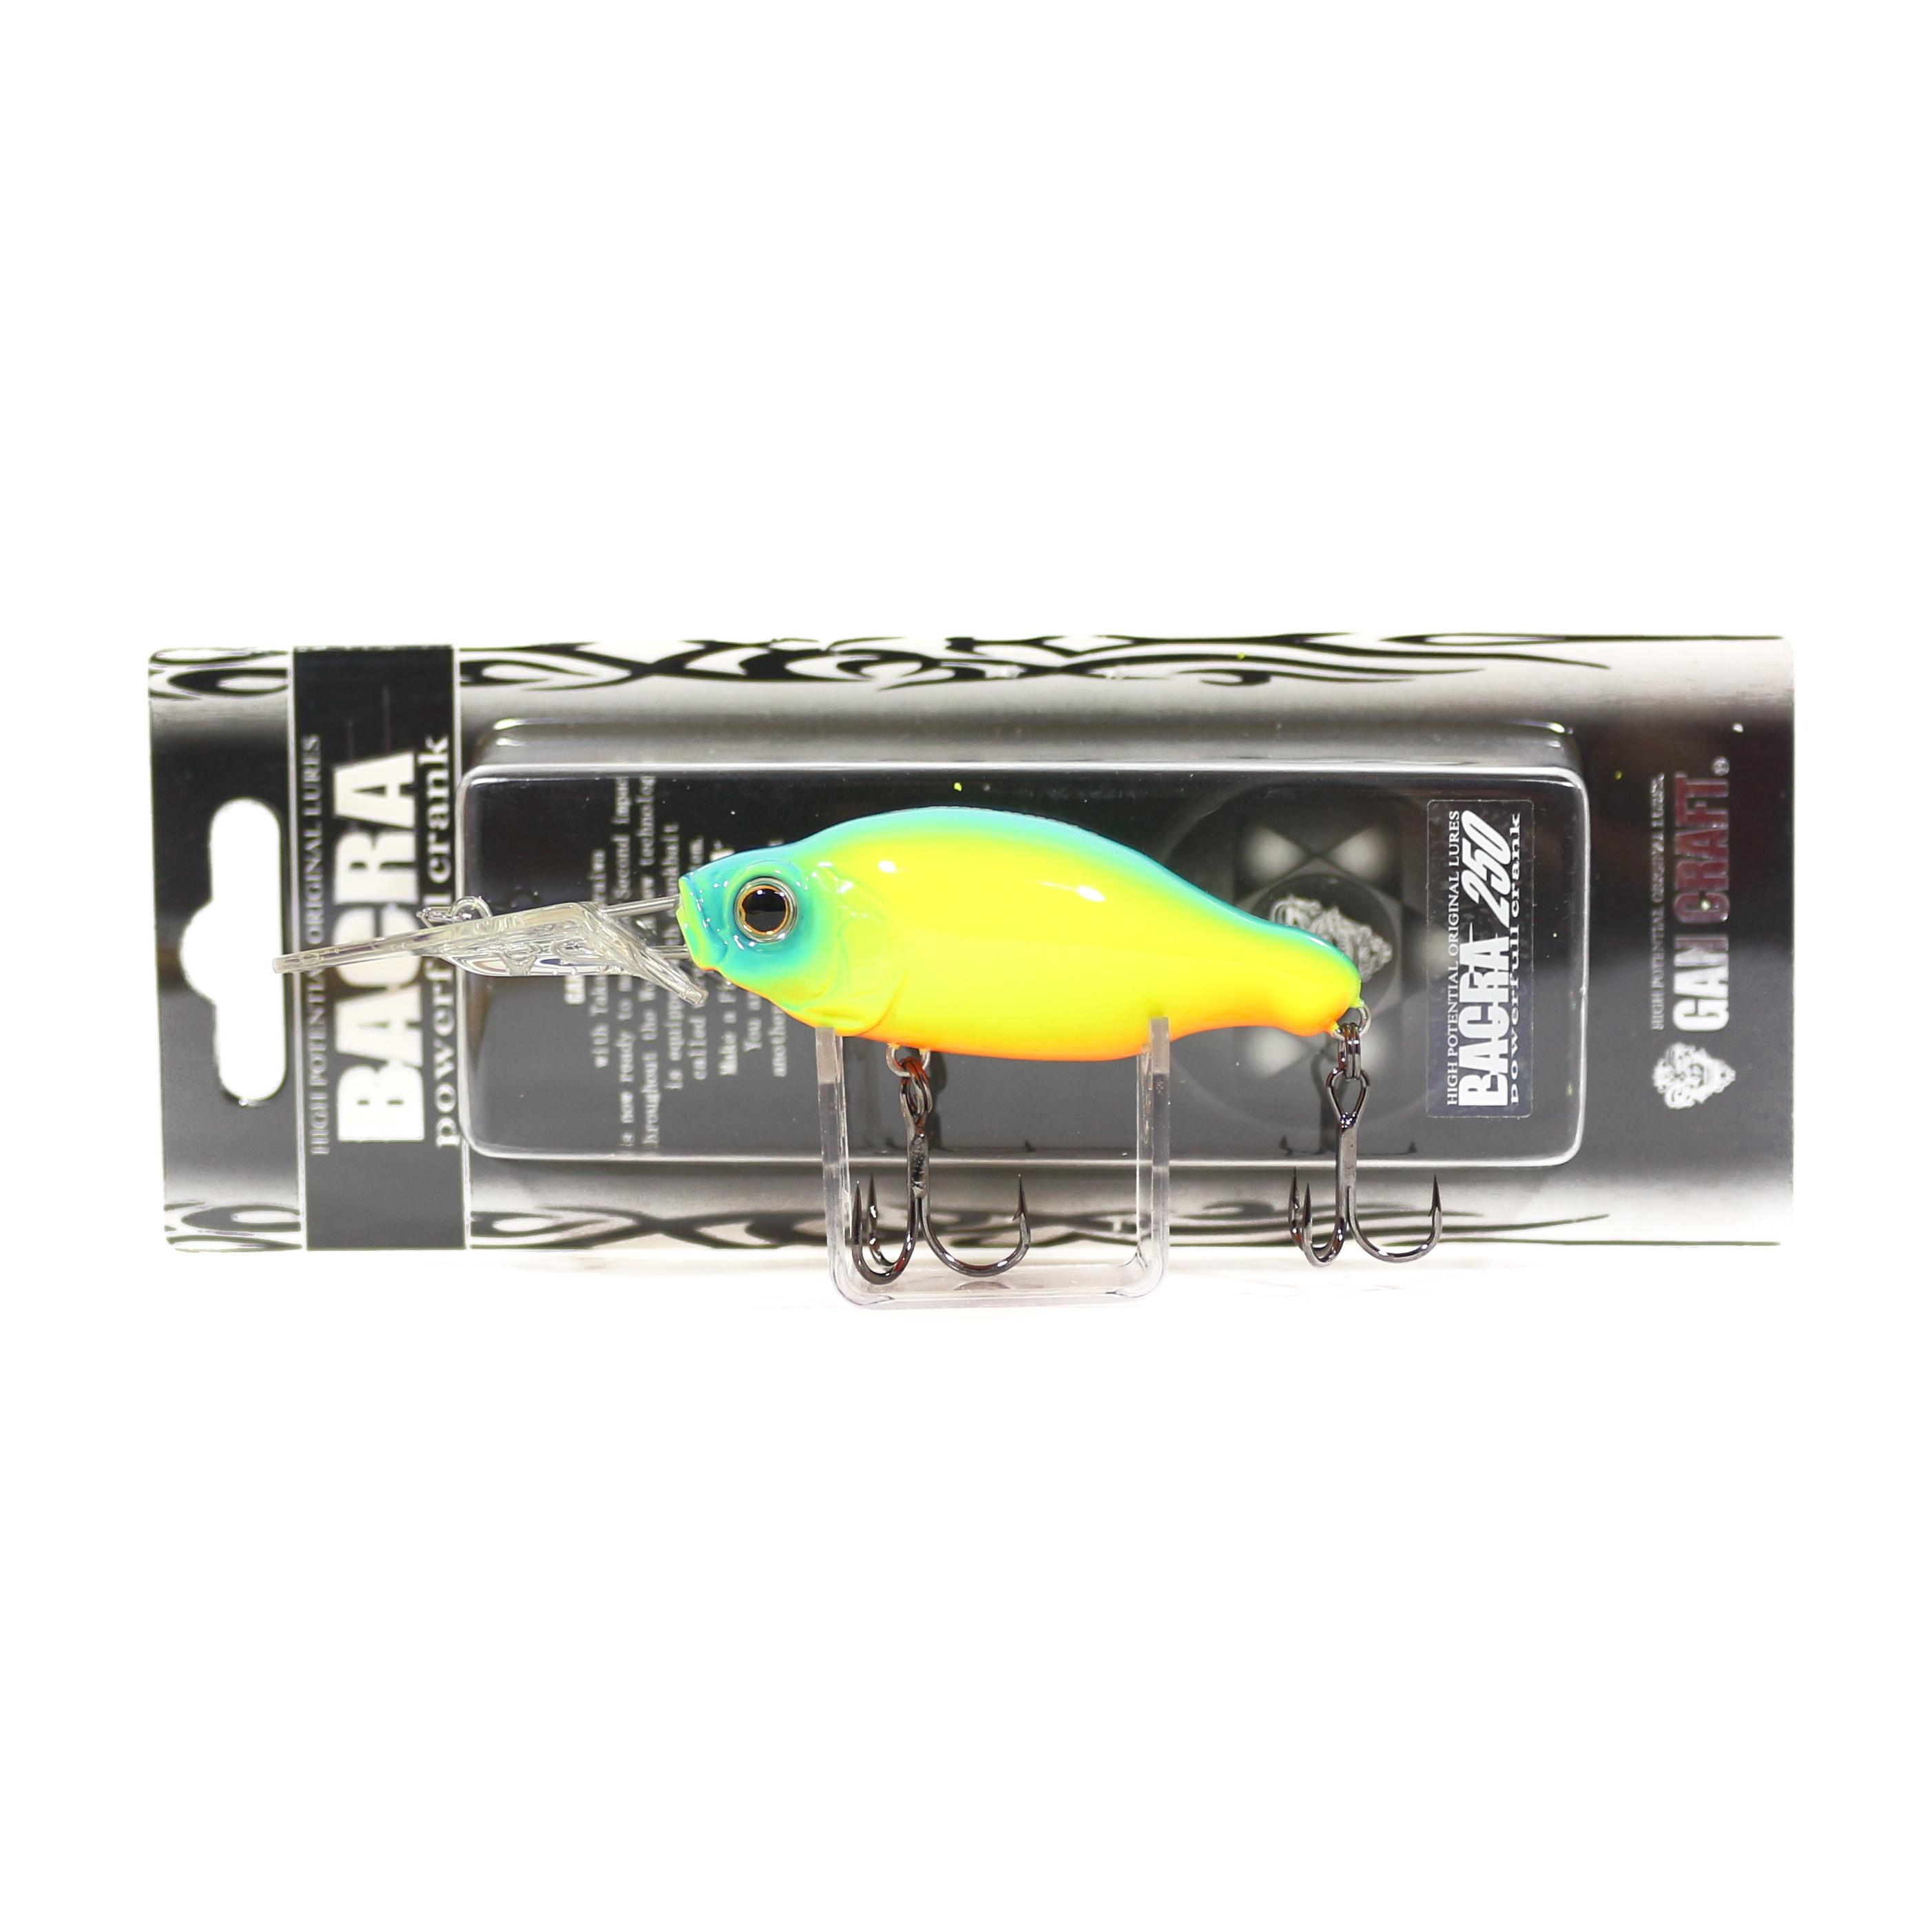 Gan Craft Bacra 250 Diving Crank Bait Floating Lure 11 (8335)